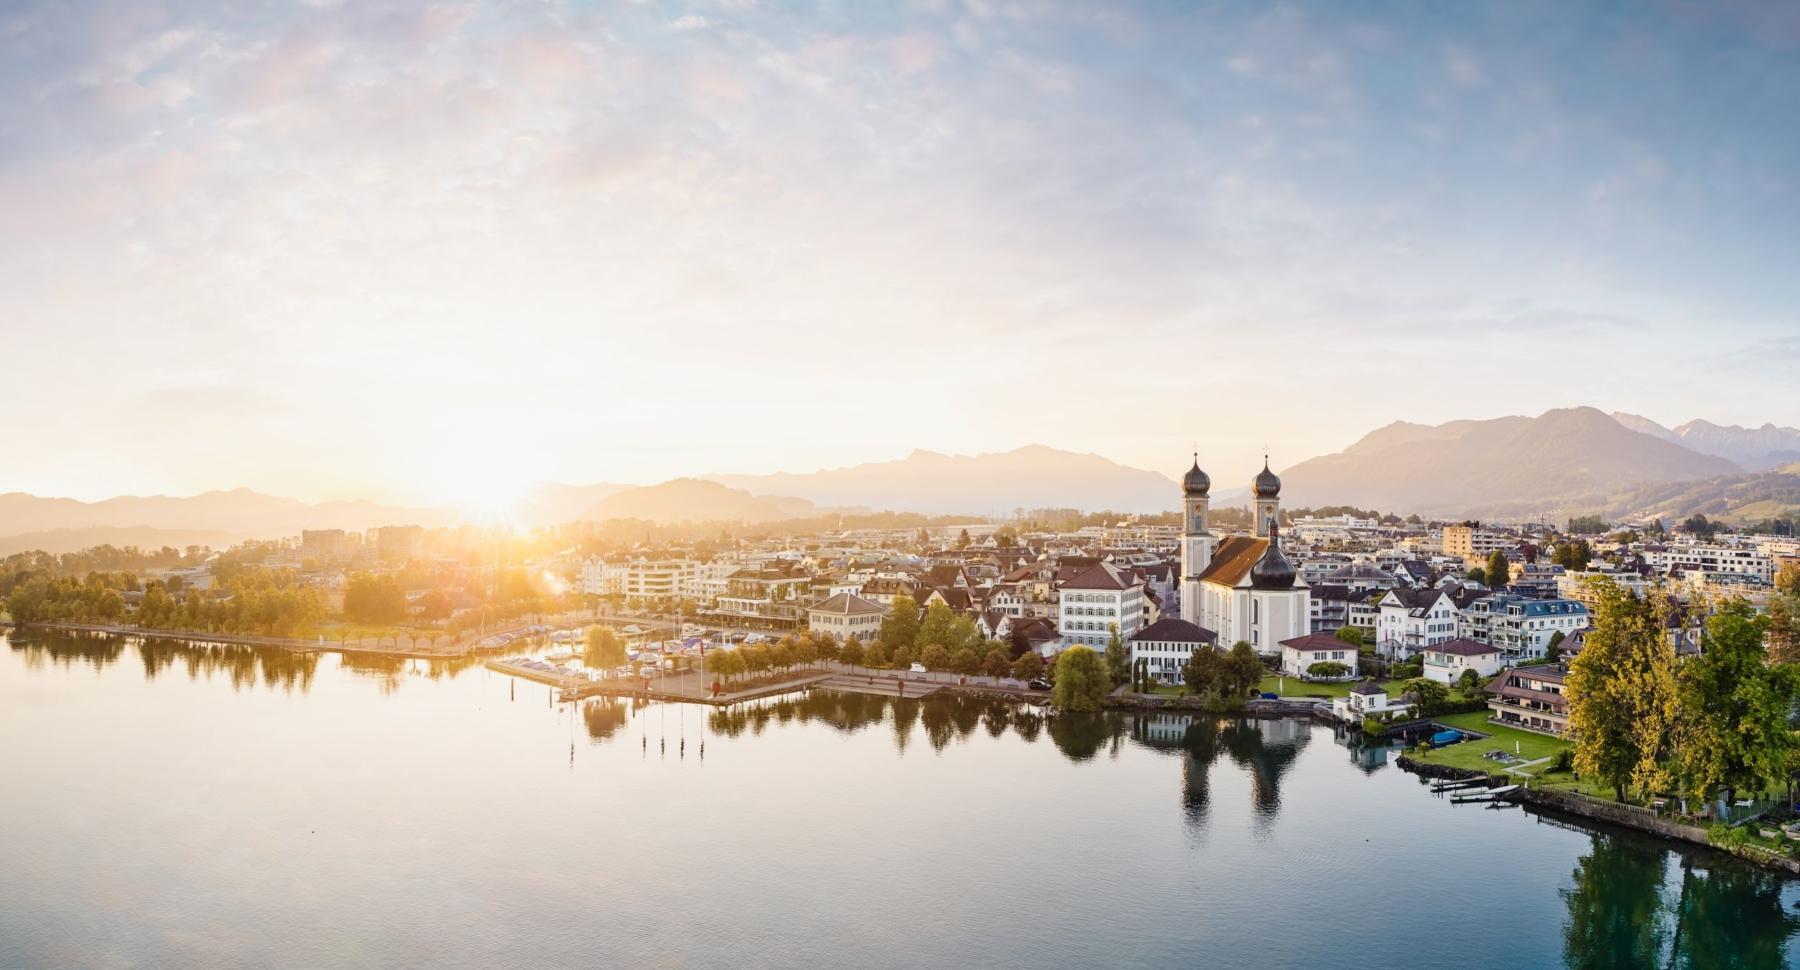 Luftaufnahme, Schwyz, Lachen, Obersee, Sonnenaufgang, Marina, Barockkirche